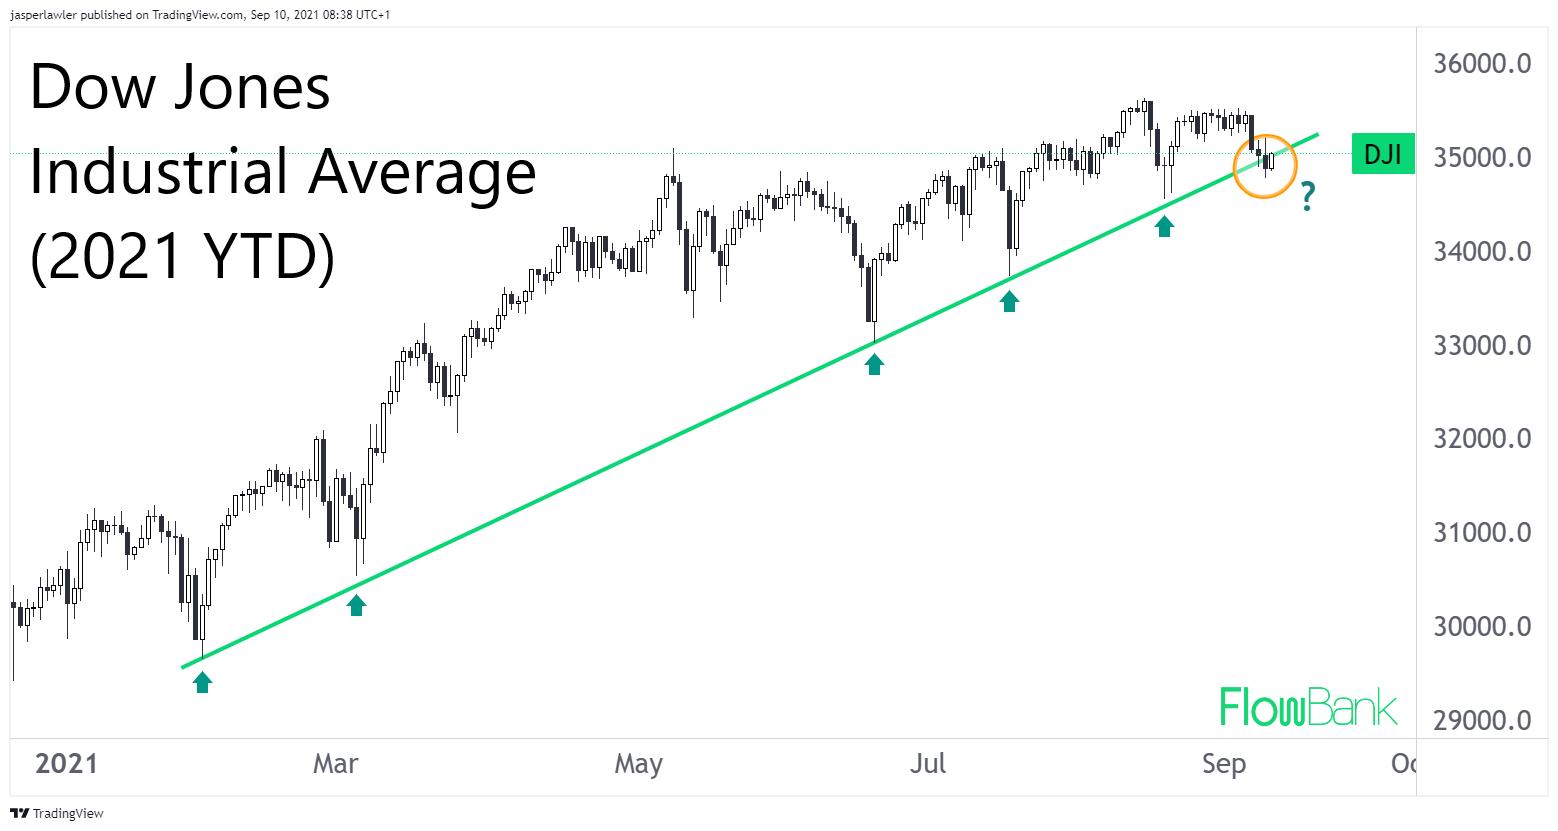 Dow Jones index: Did the 2021 uptrend just snap?